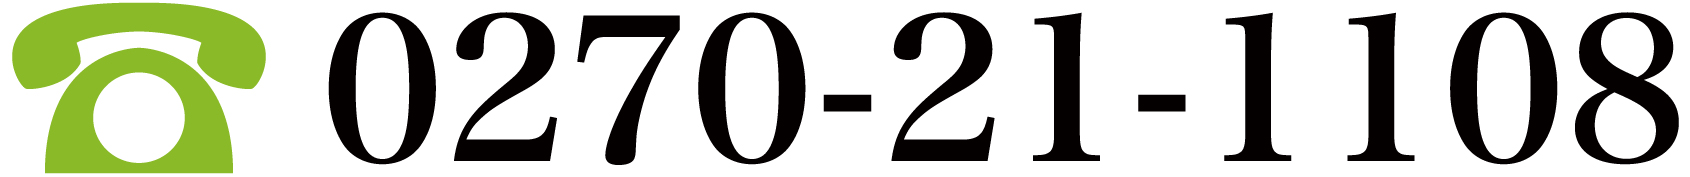 0270-21-1108